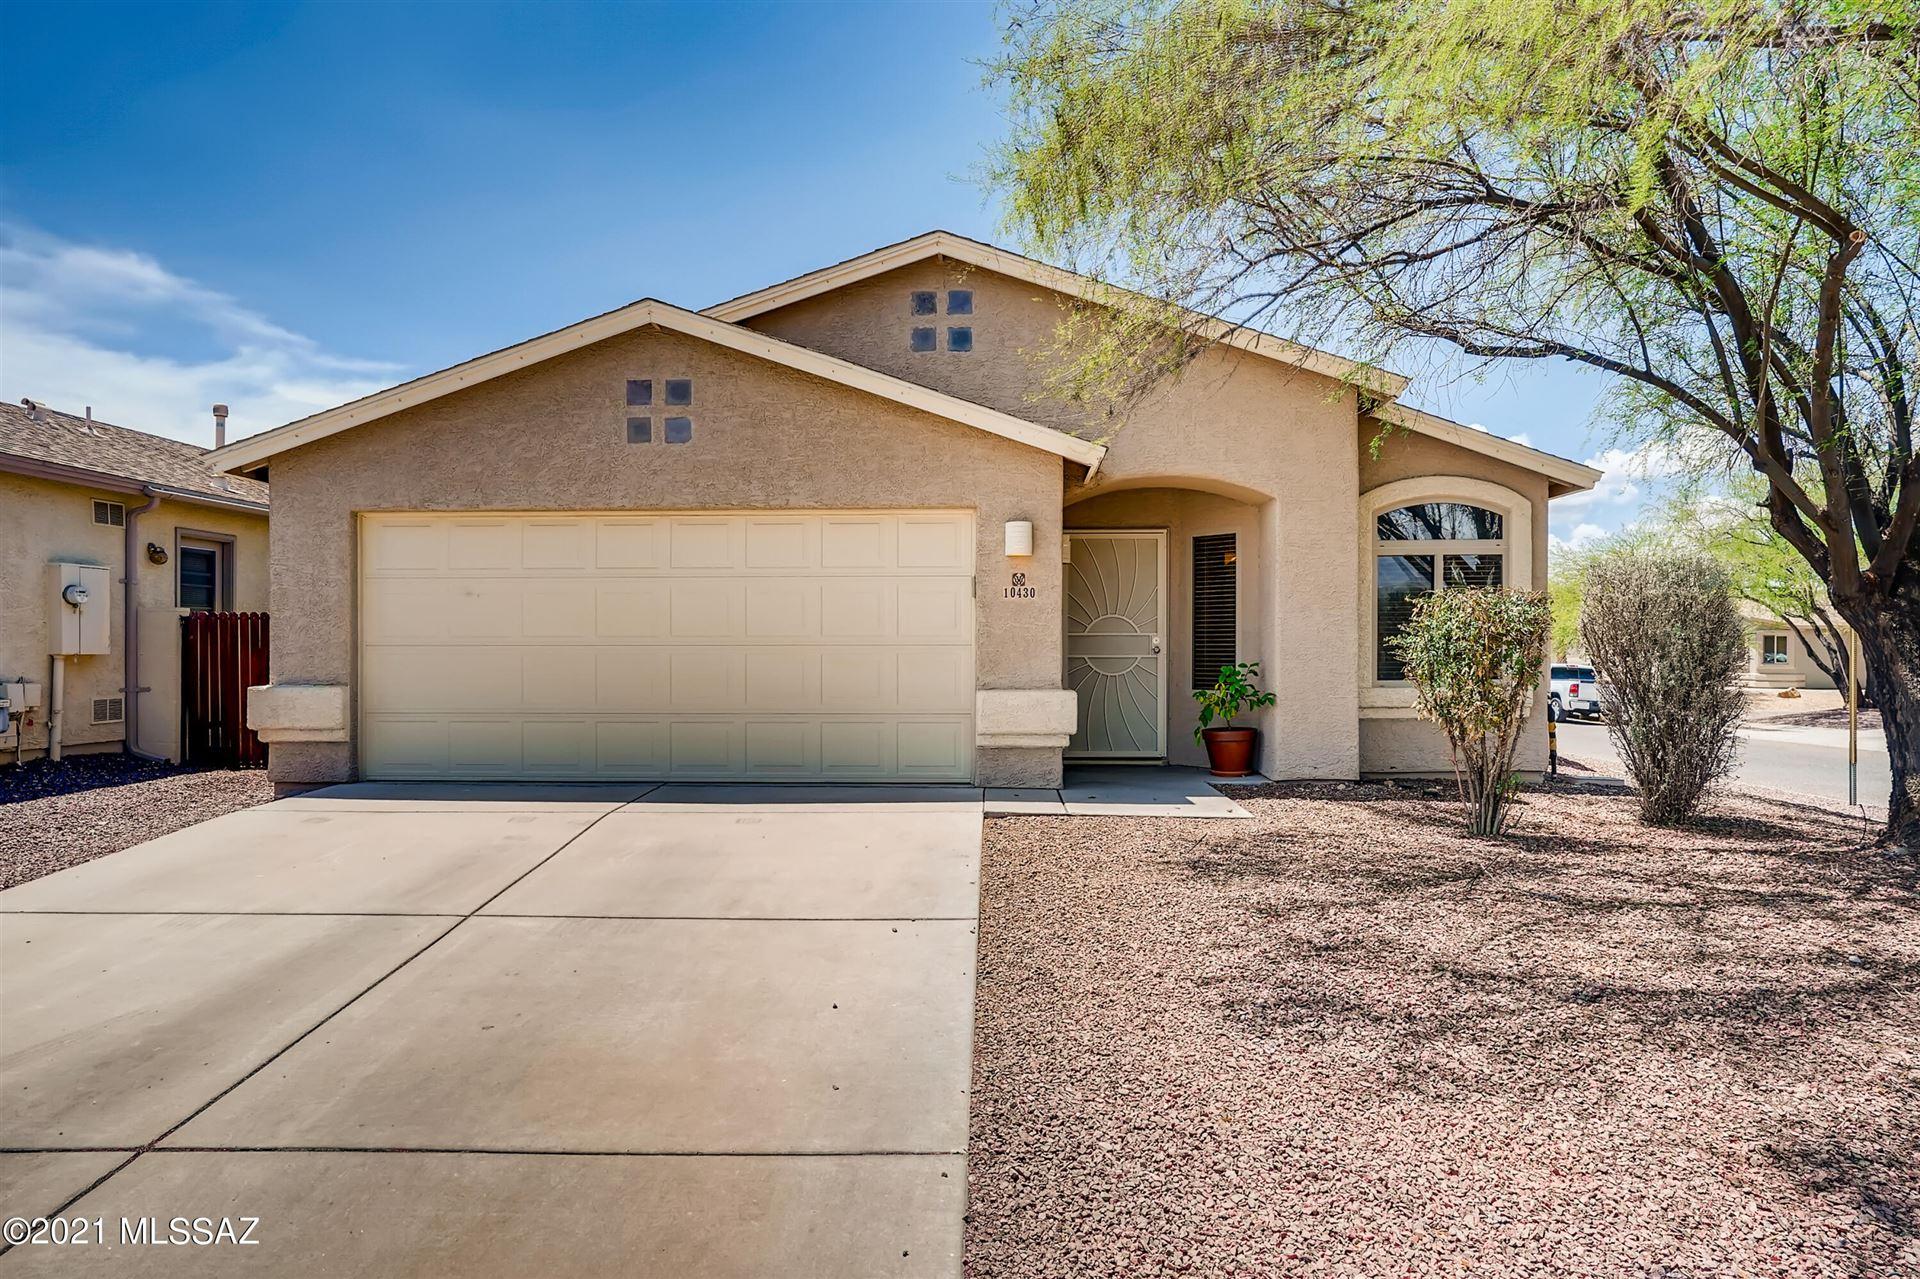 10430 E Chelan Street, Tucson, AZ 85747 - MLS#: 22116754